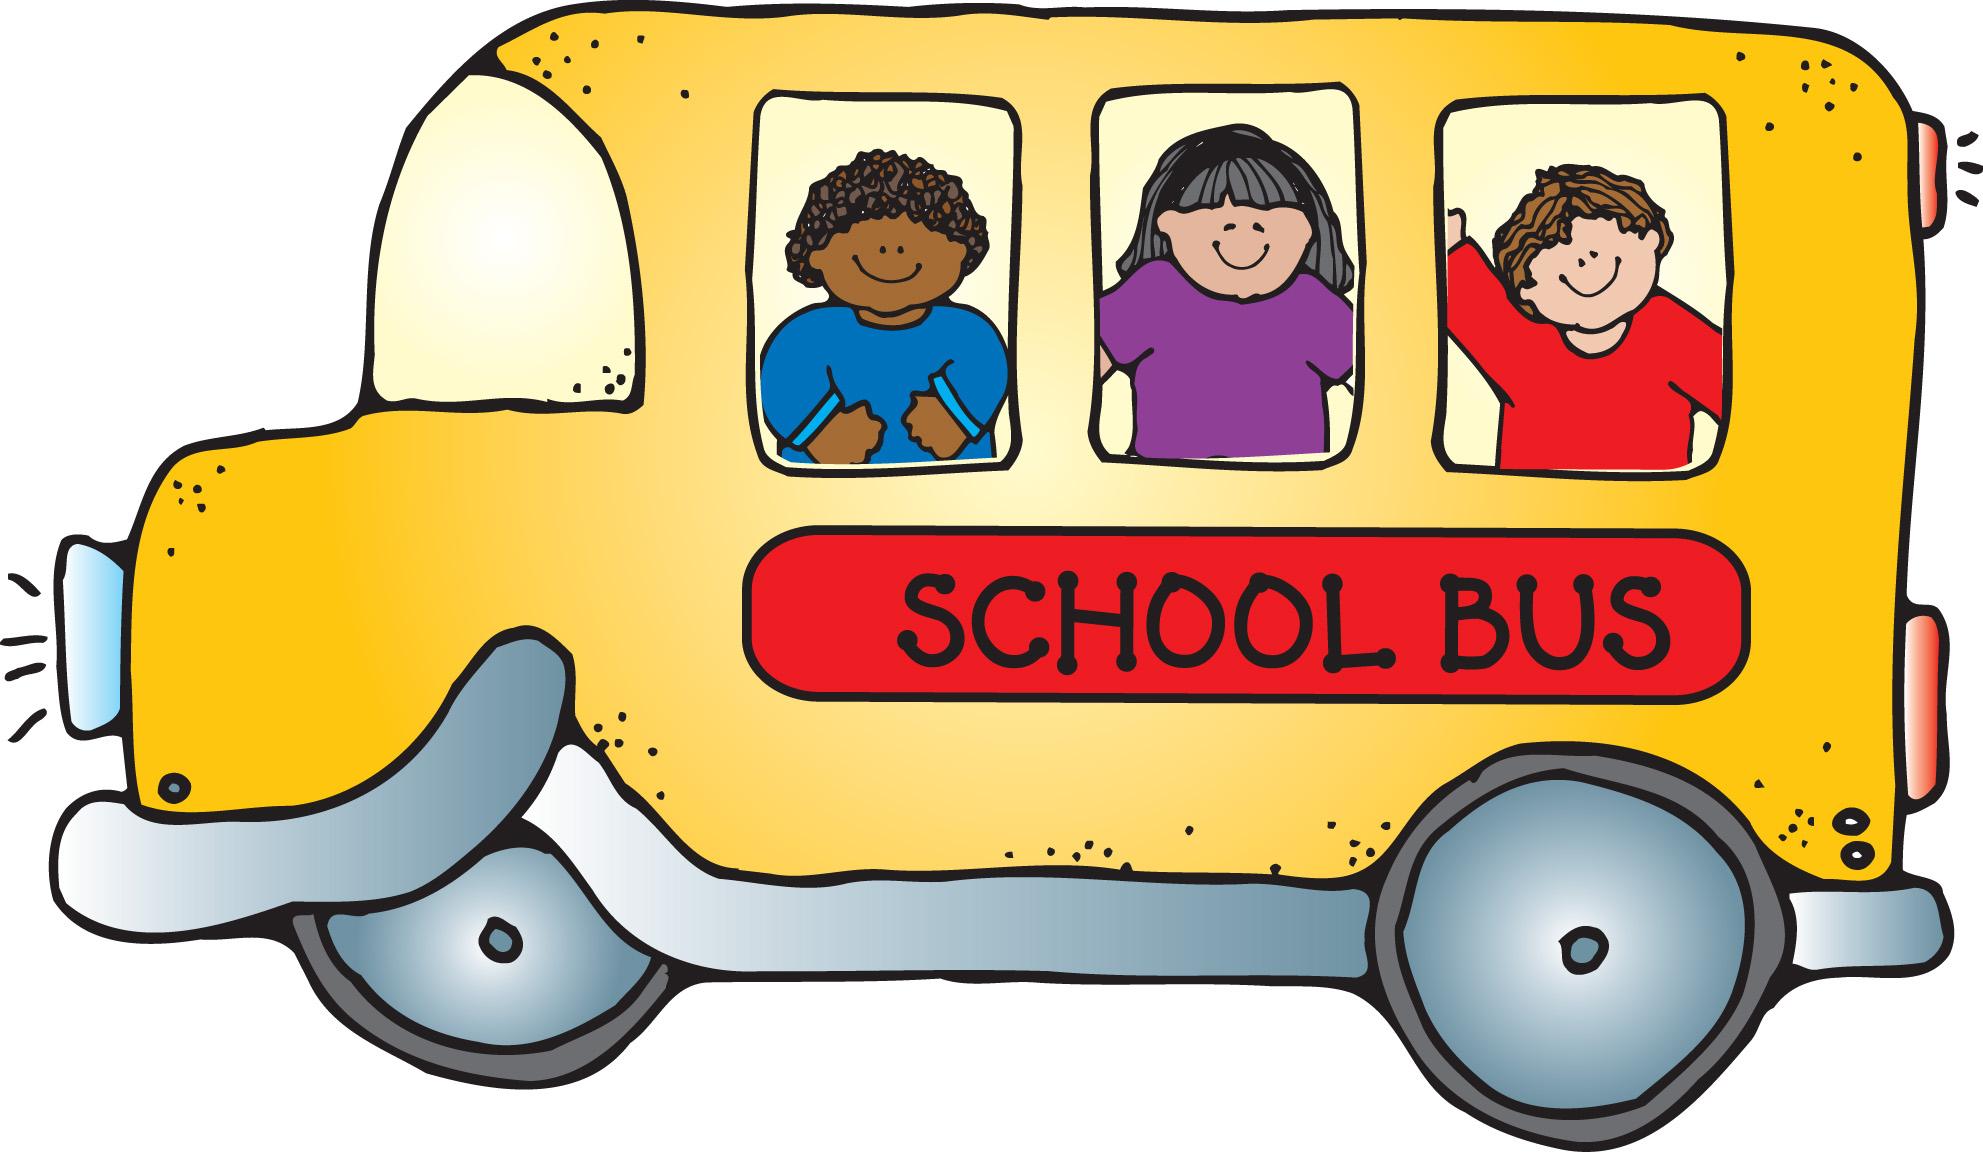 Free car cliparts download. Cars clipart school